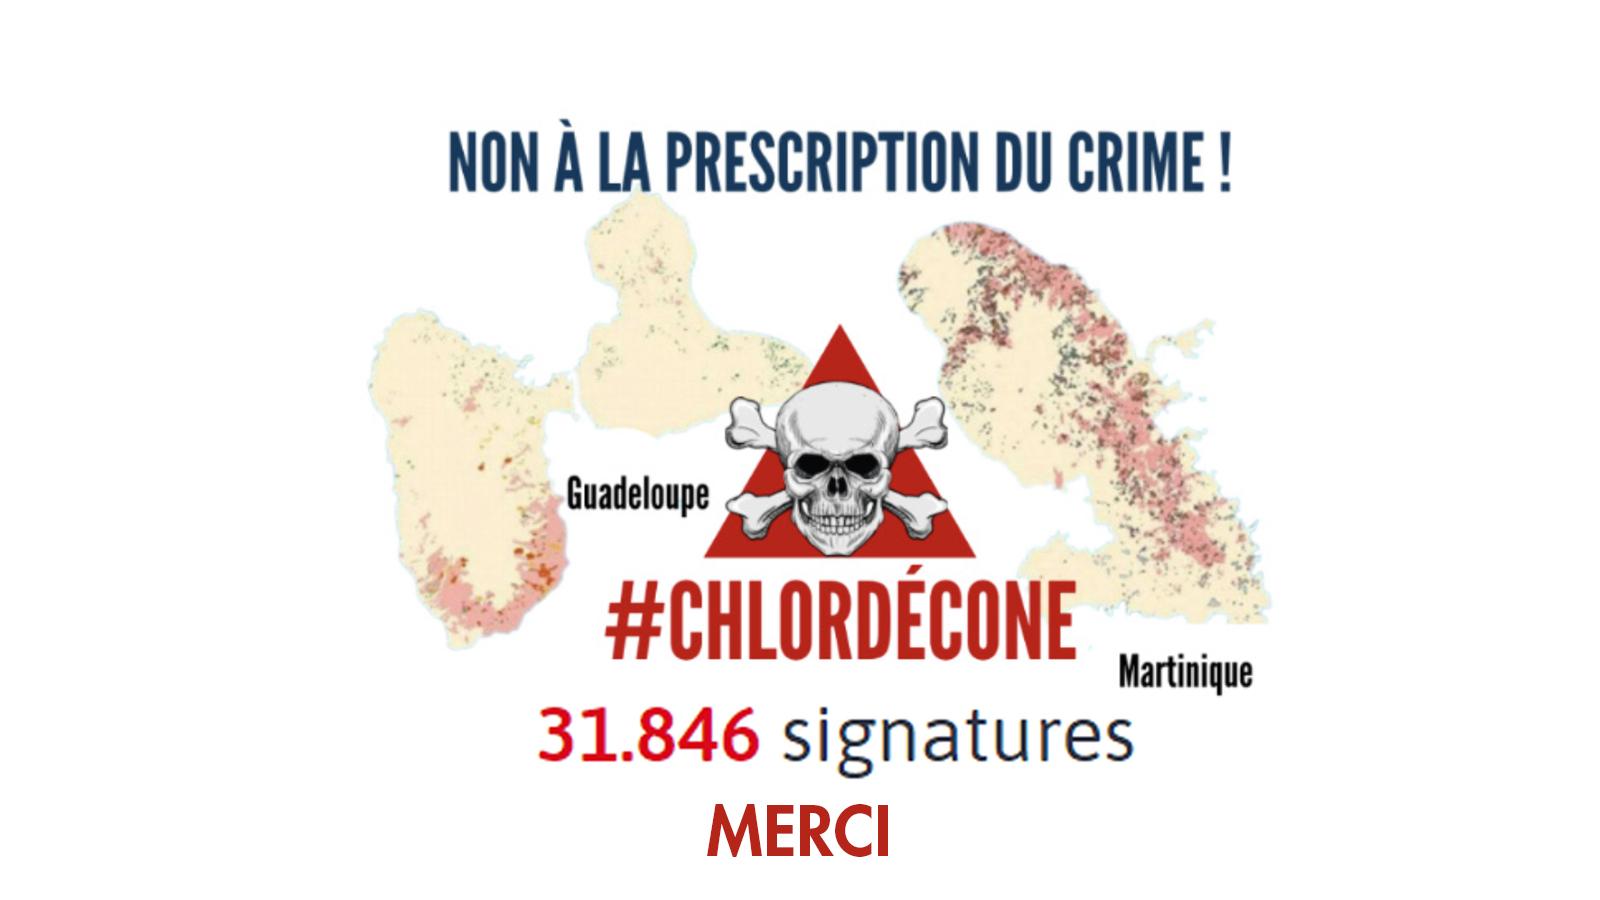 non-chlordecone-merci-signature